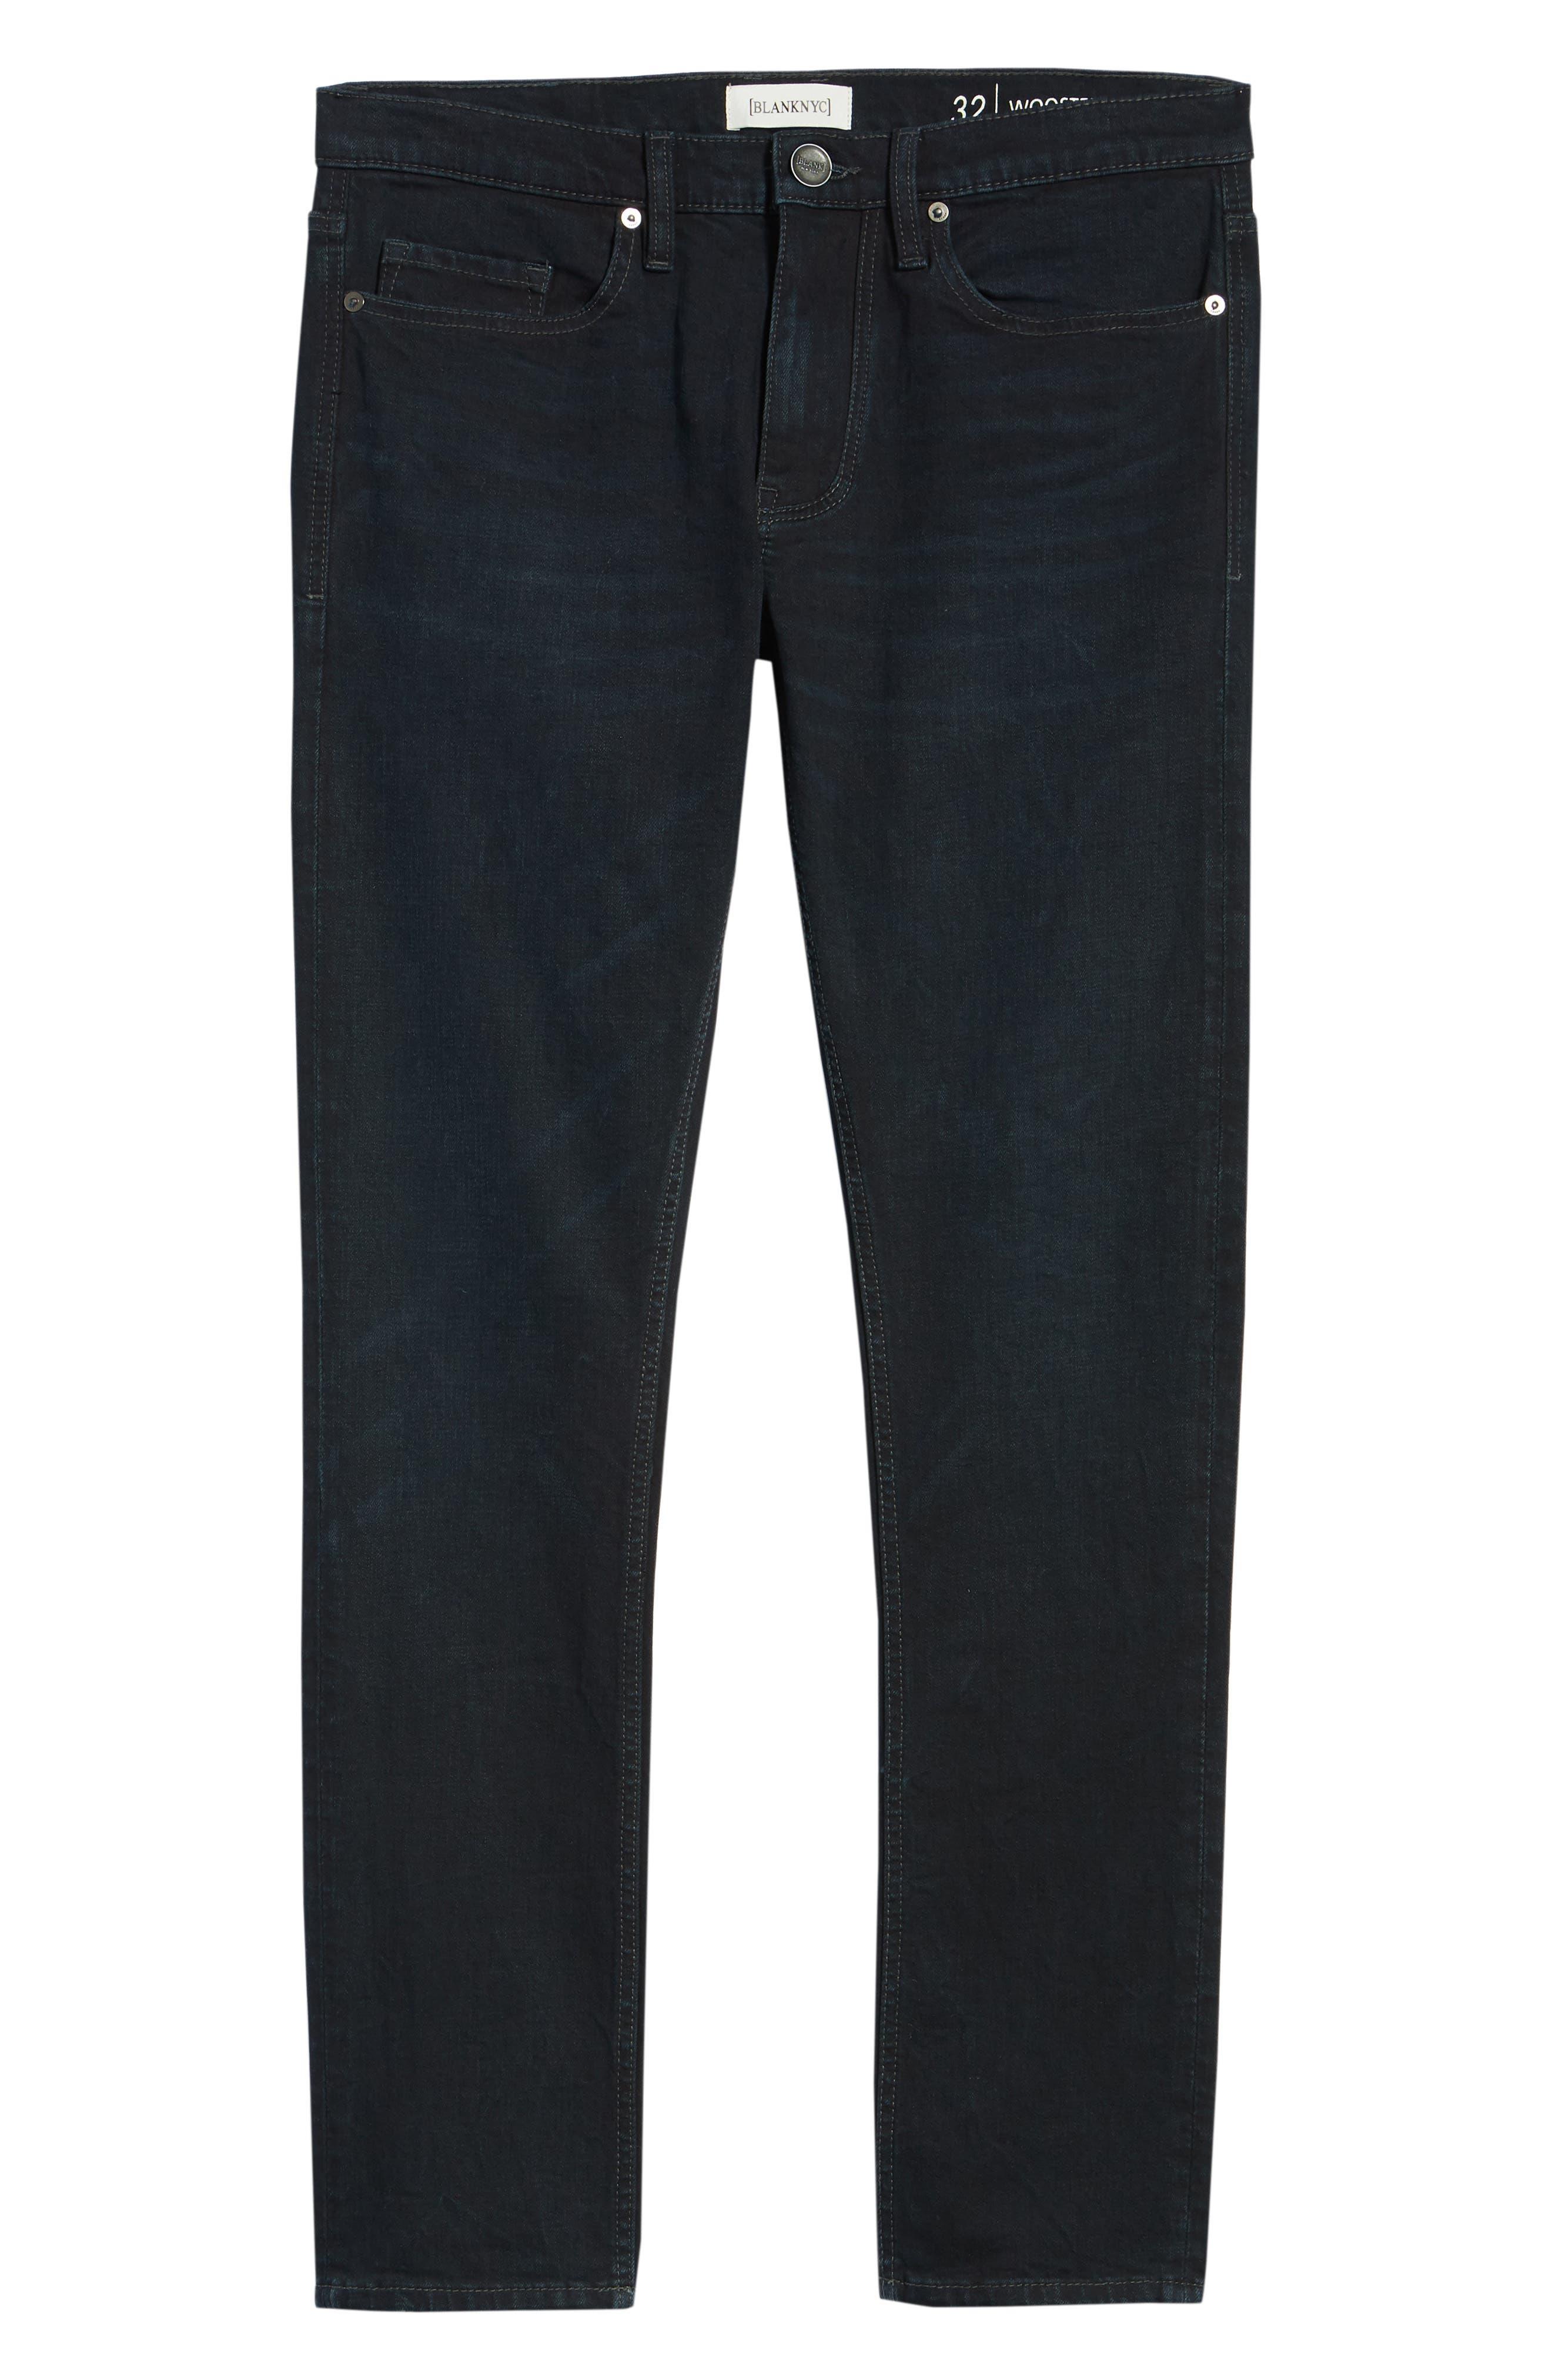 Wooster Slim Fit Jeans,                             Alternate thumbnail 6, color,                             409